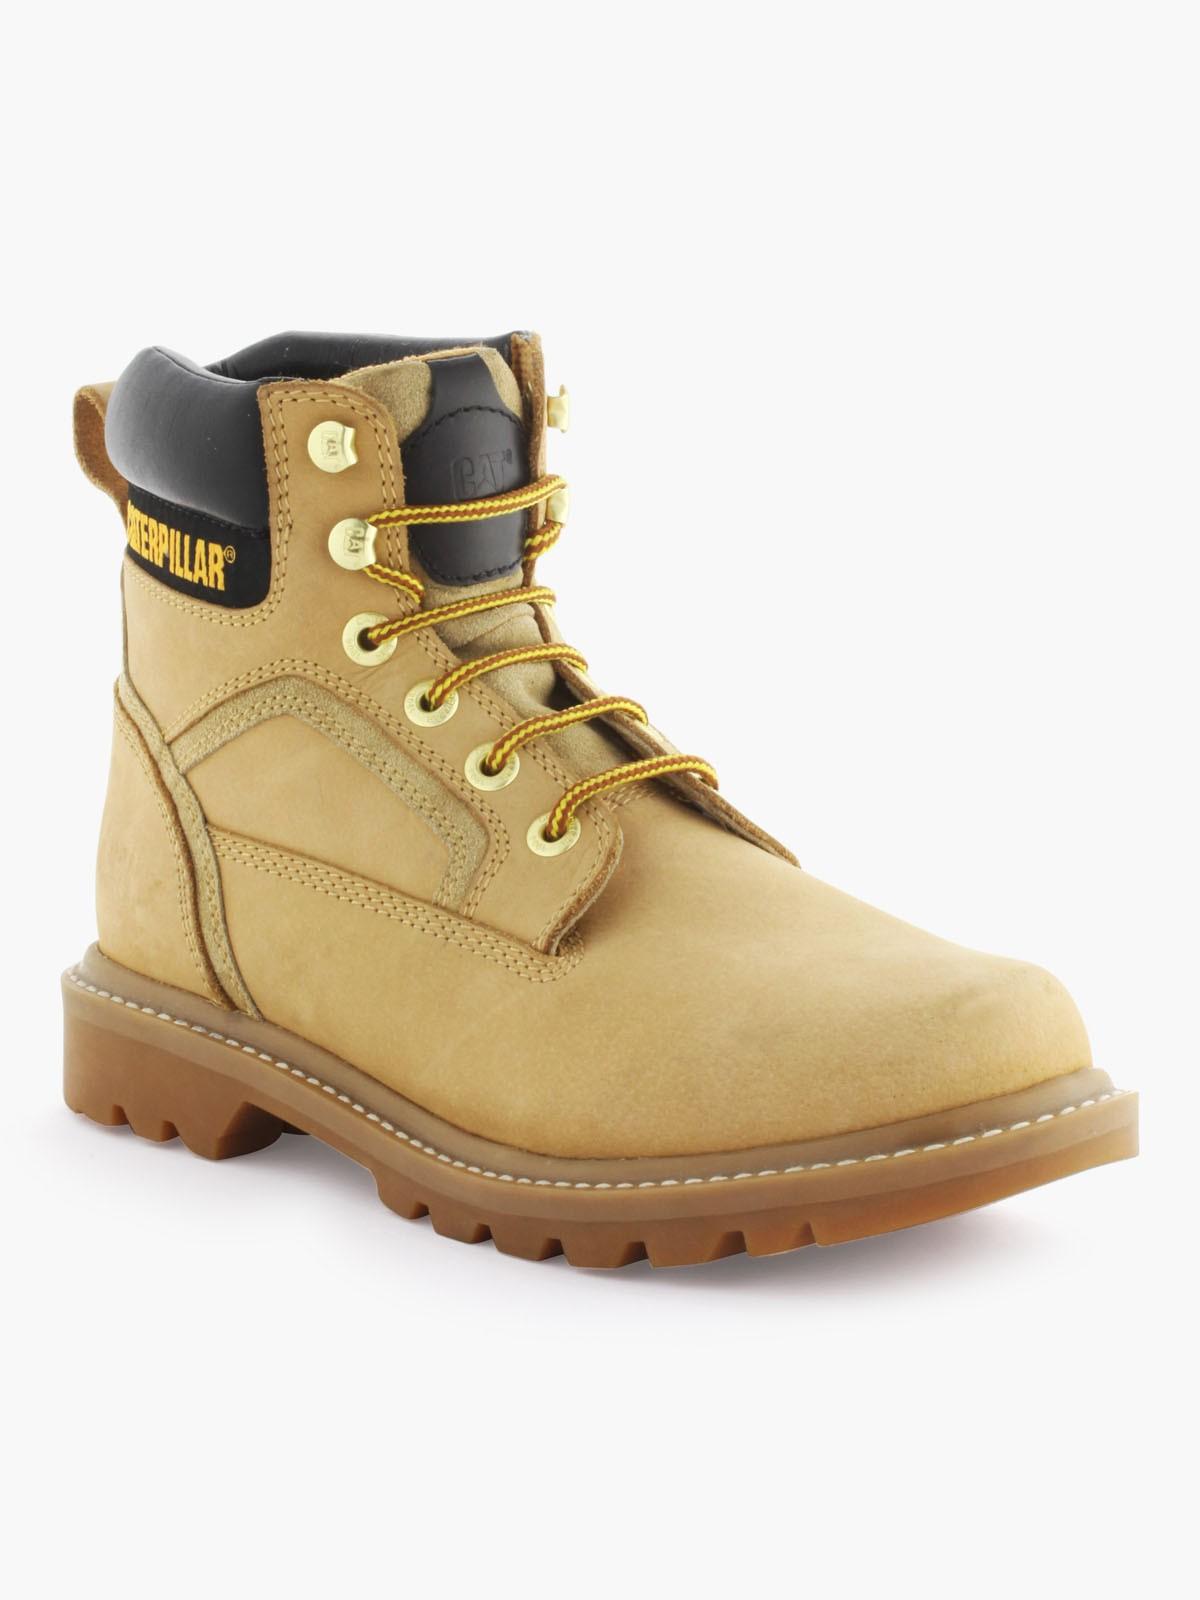 Chaussures Caterpillar Bridgeport (Tailles 40, 45 et 46)